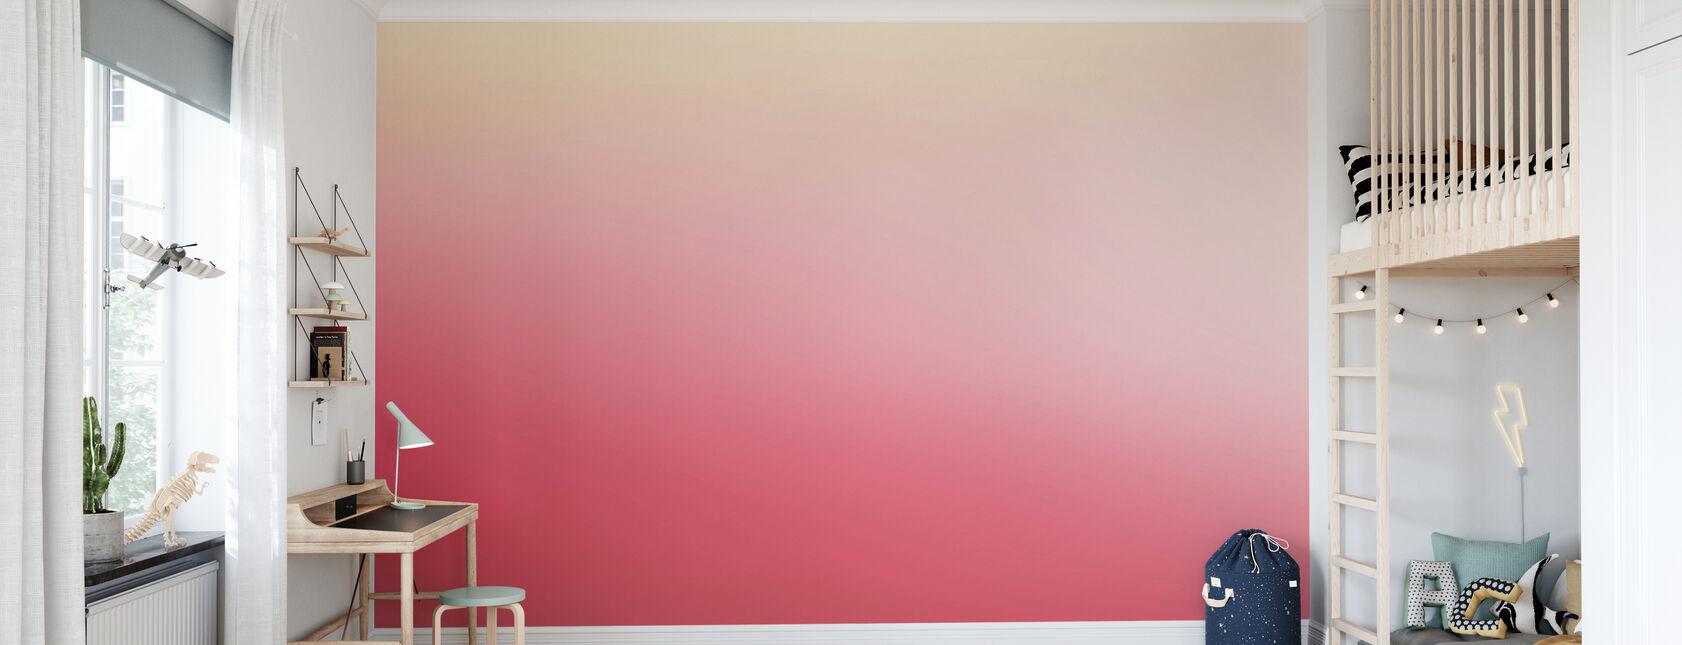 Miami Pink Grape - Wallpaper - Kids Room